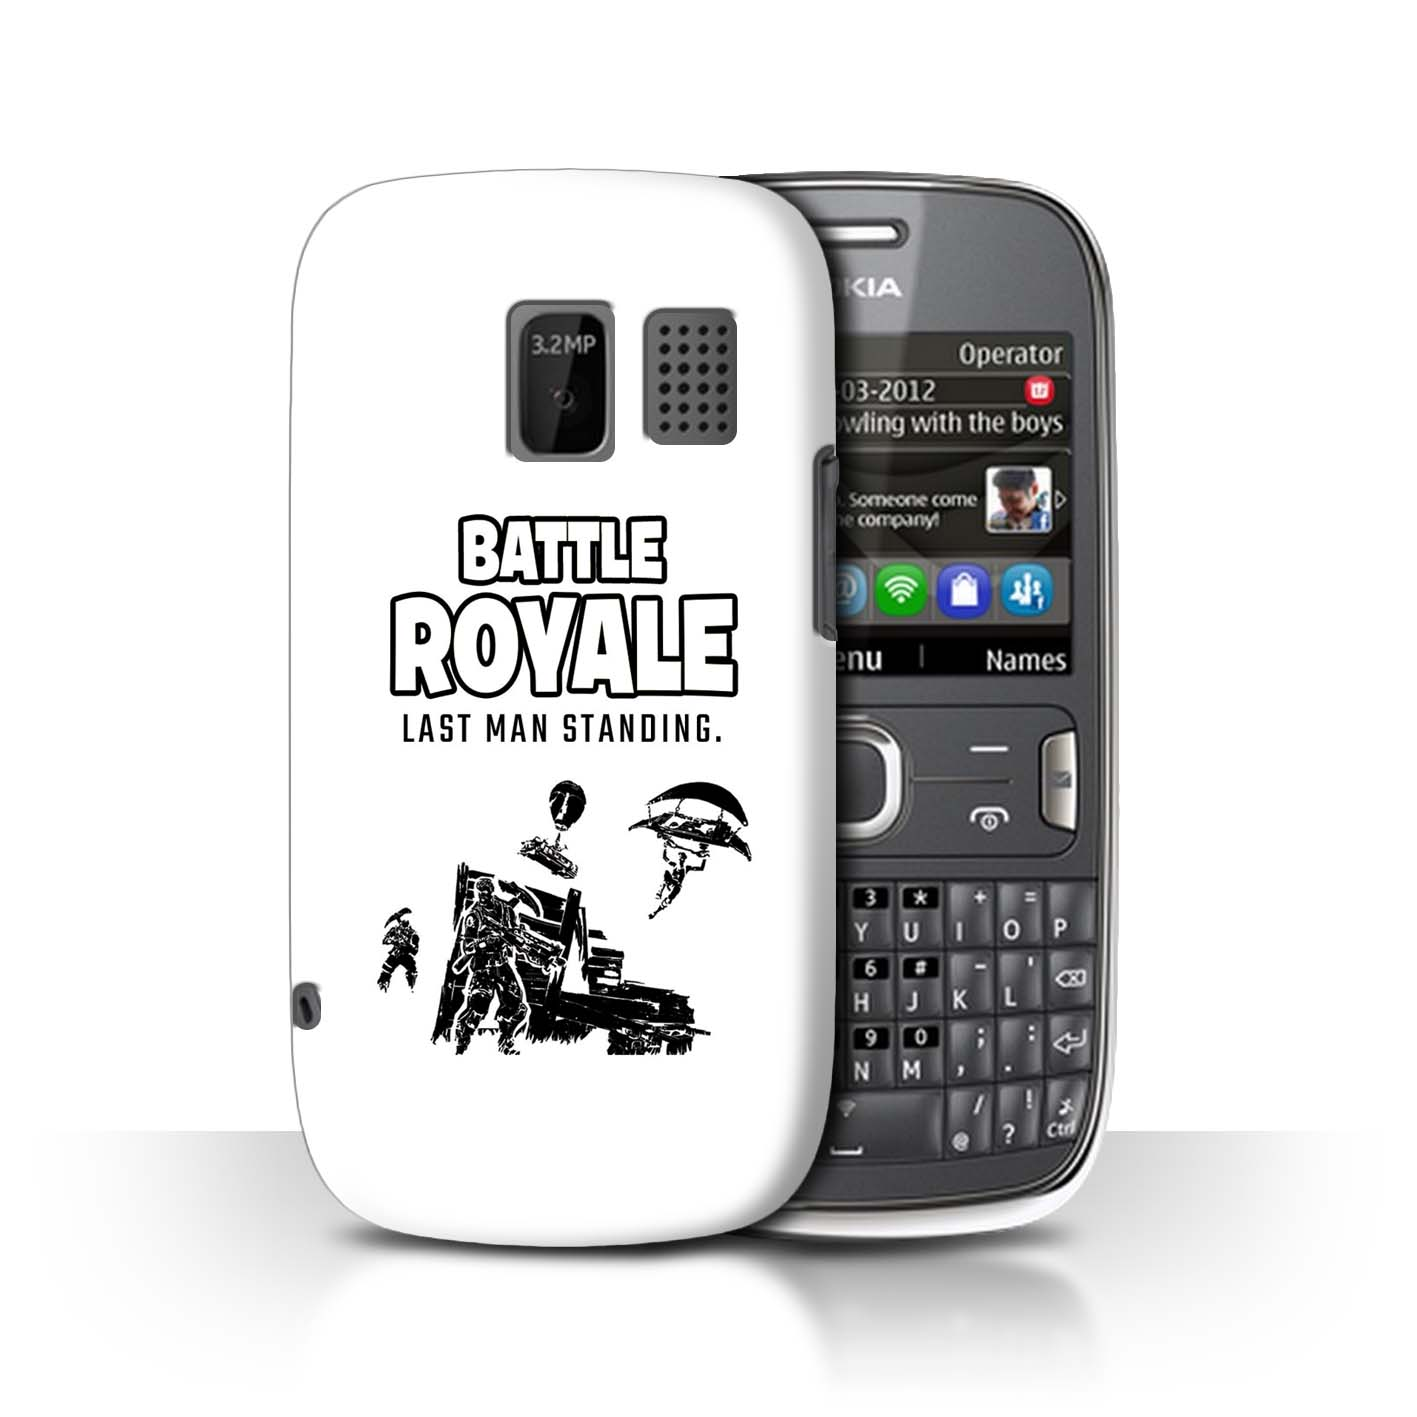 STUFF4-Phone-Case-Back-Cover-for-Nokia-Asha-302-FN-Battle-Royale